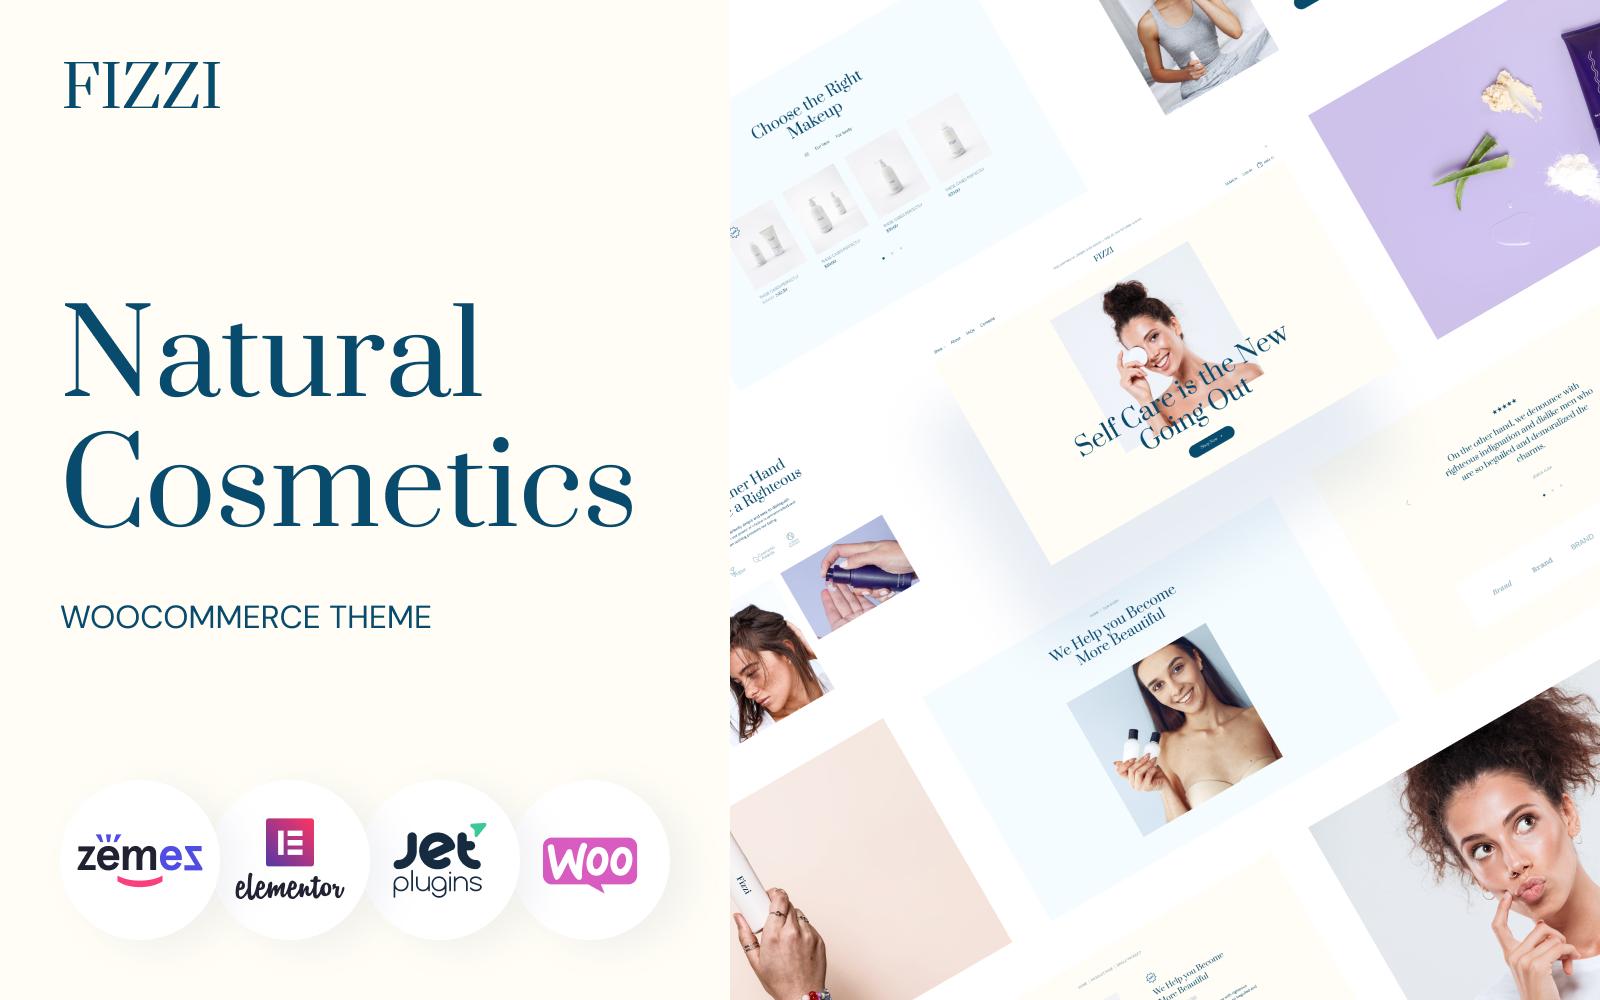 Natural Cosmetics Website Template - Fizzi WooCommerce Theme